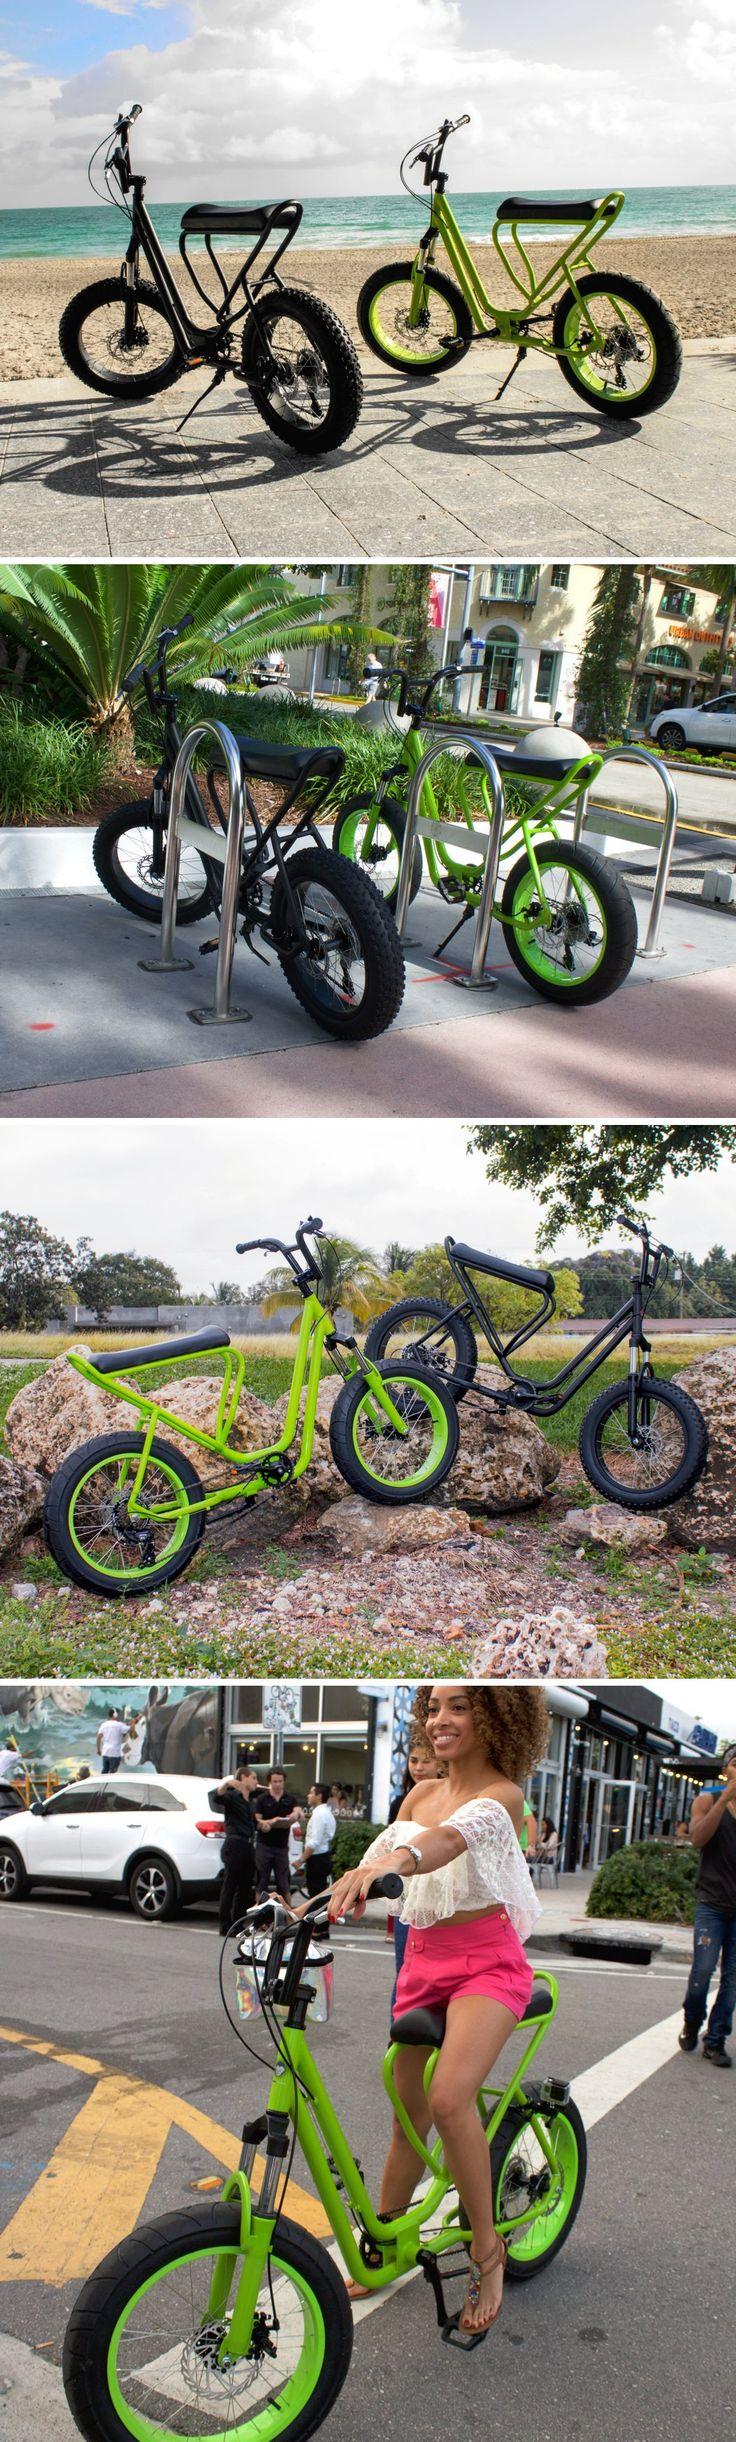 This bike is a beach-cruising, urban-commuting, campus-crushing, errand-running, path-pounding all-rounder!